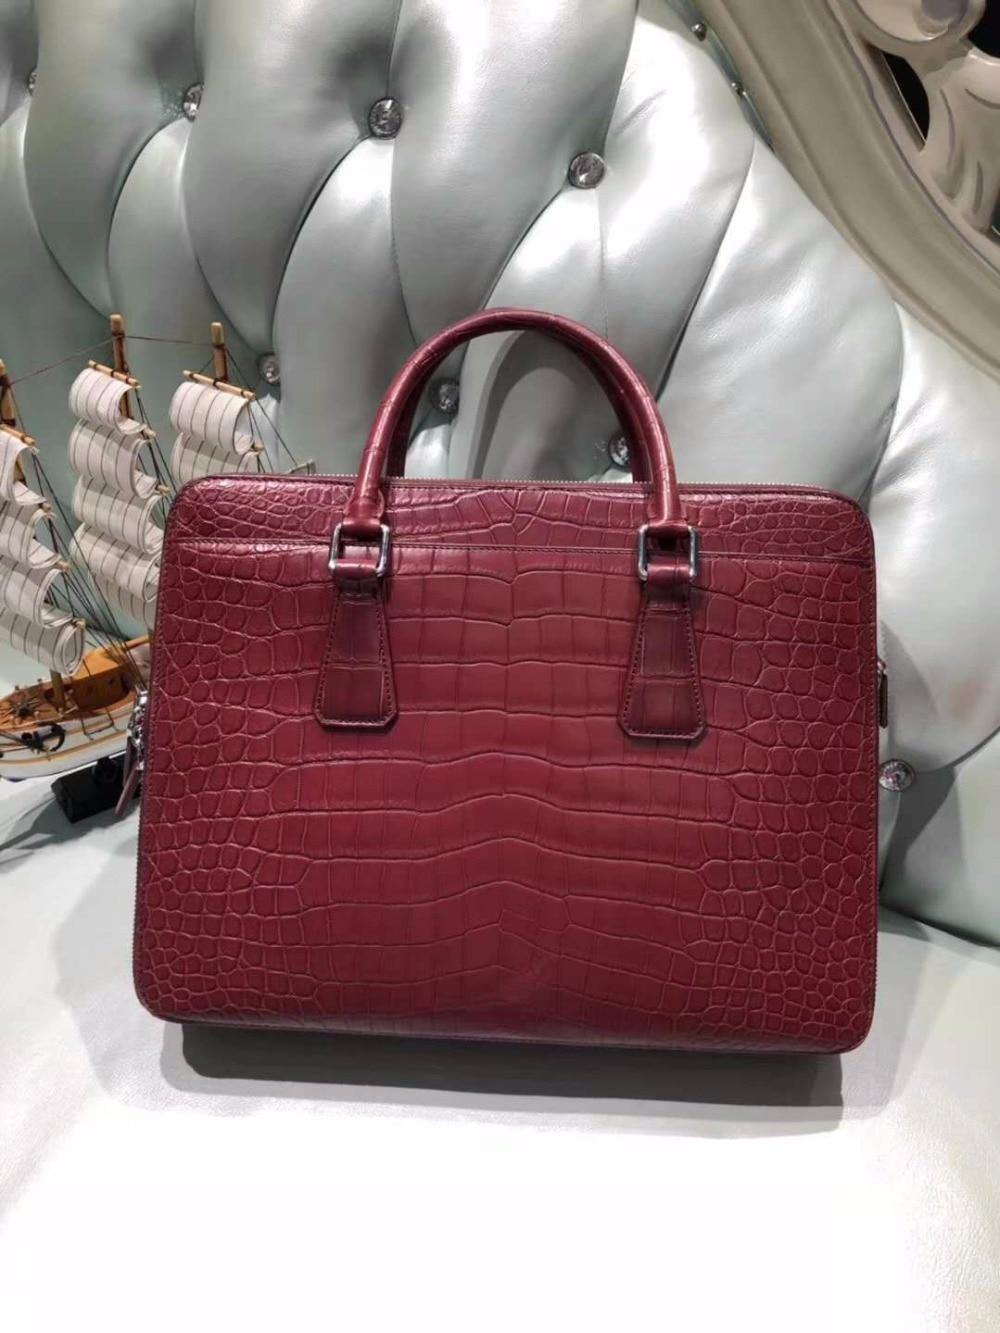 2018 Newly Design Men's Genuine/Real 100% Crocodile Belly Skin Briefcase Official Bag, Crocodile Skin Business Men Bag Red Color